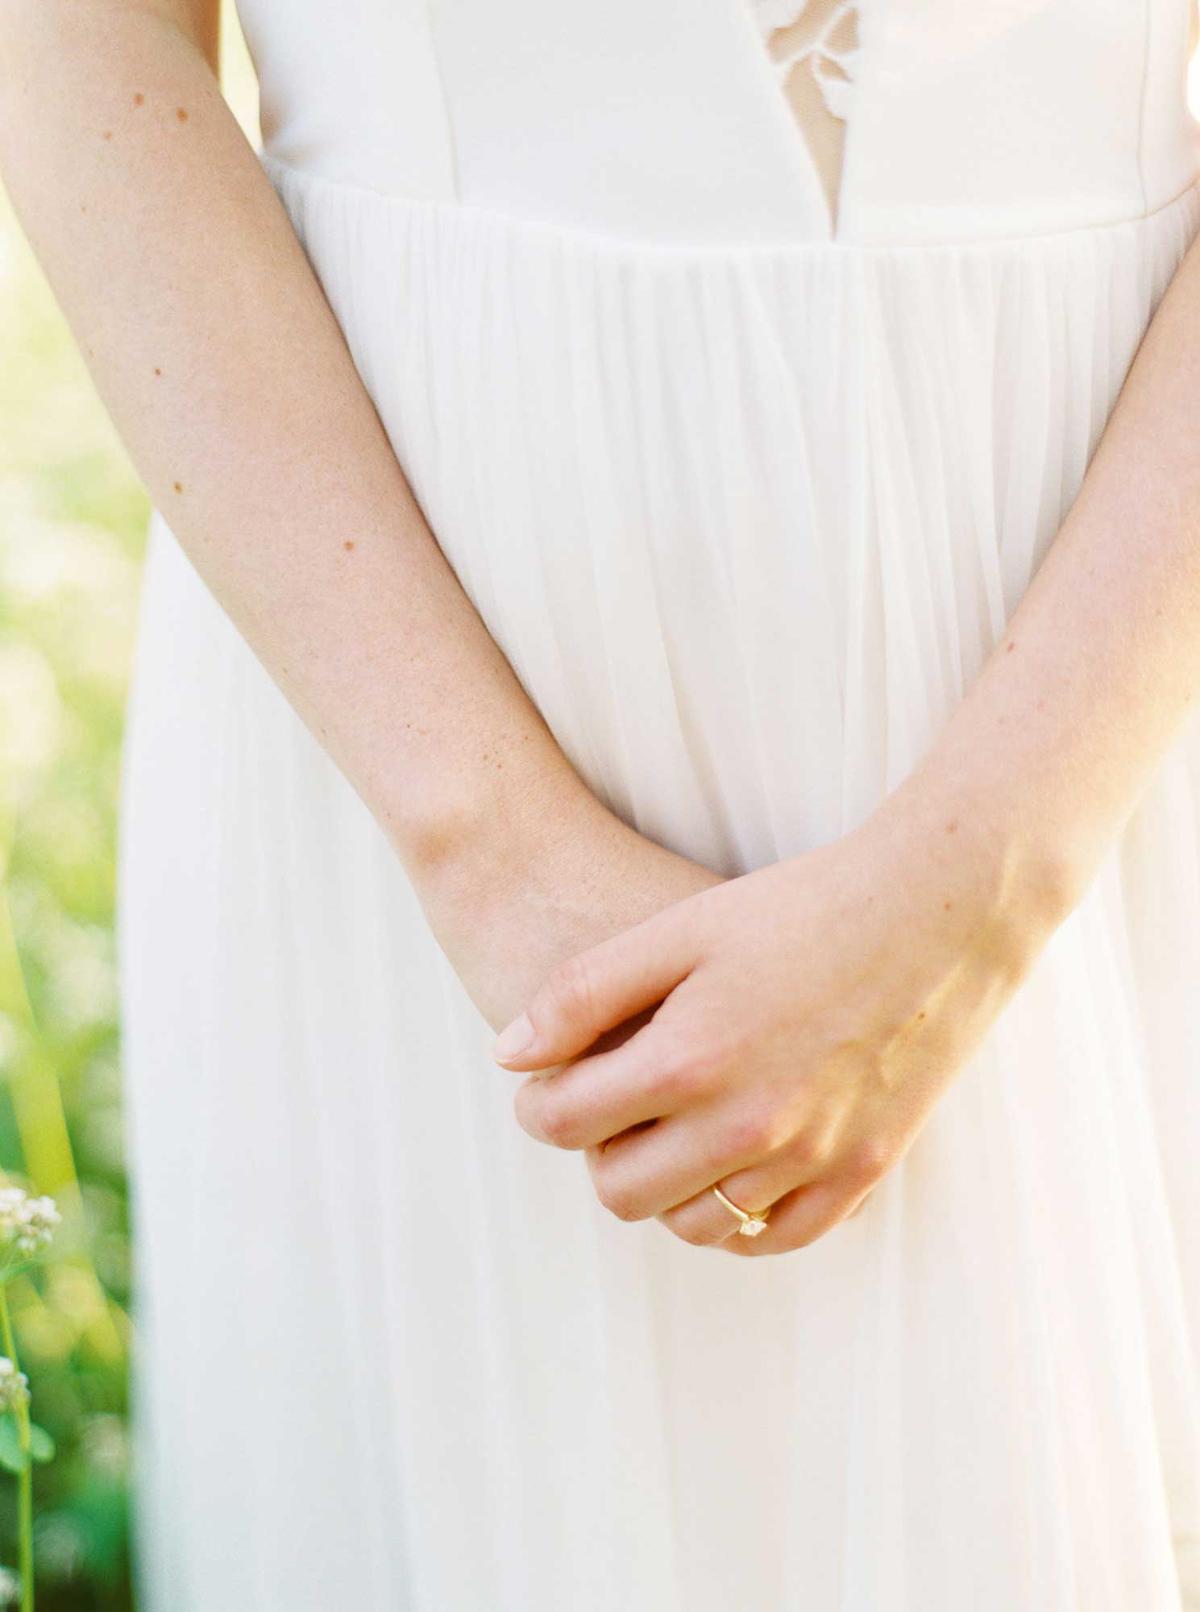 kayla-yestal-vineyard-bride-swish-list-woodland-weddings-niagara-wedding-editorial-44.jpg